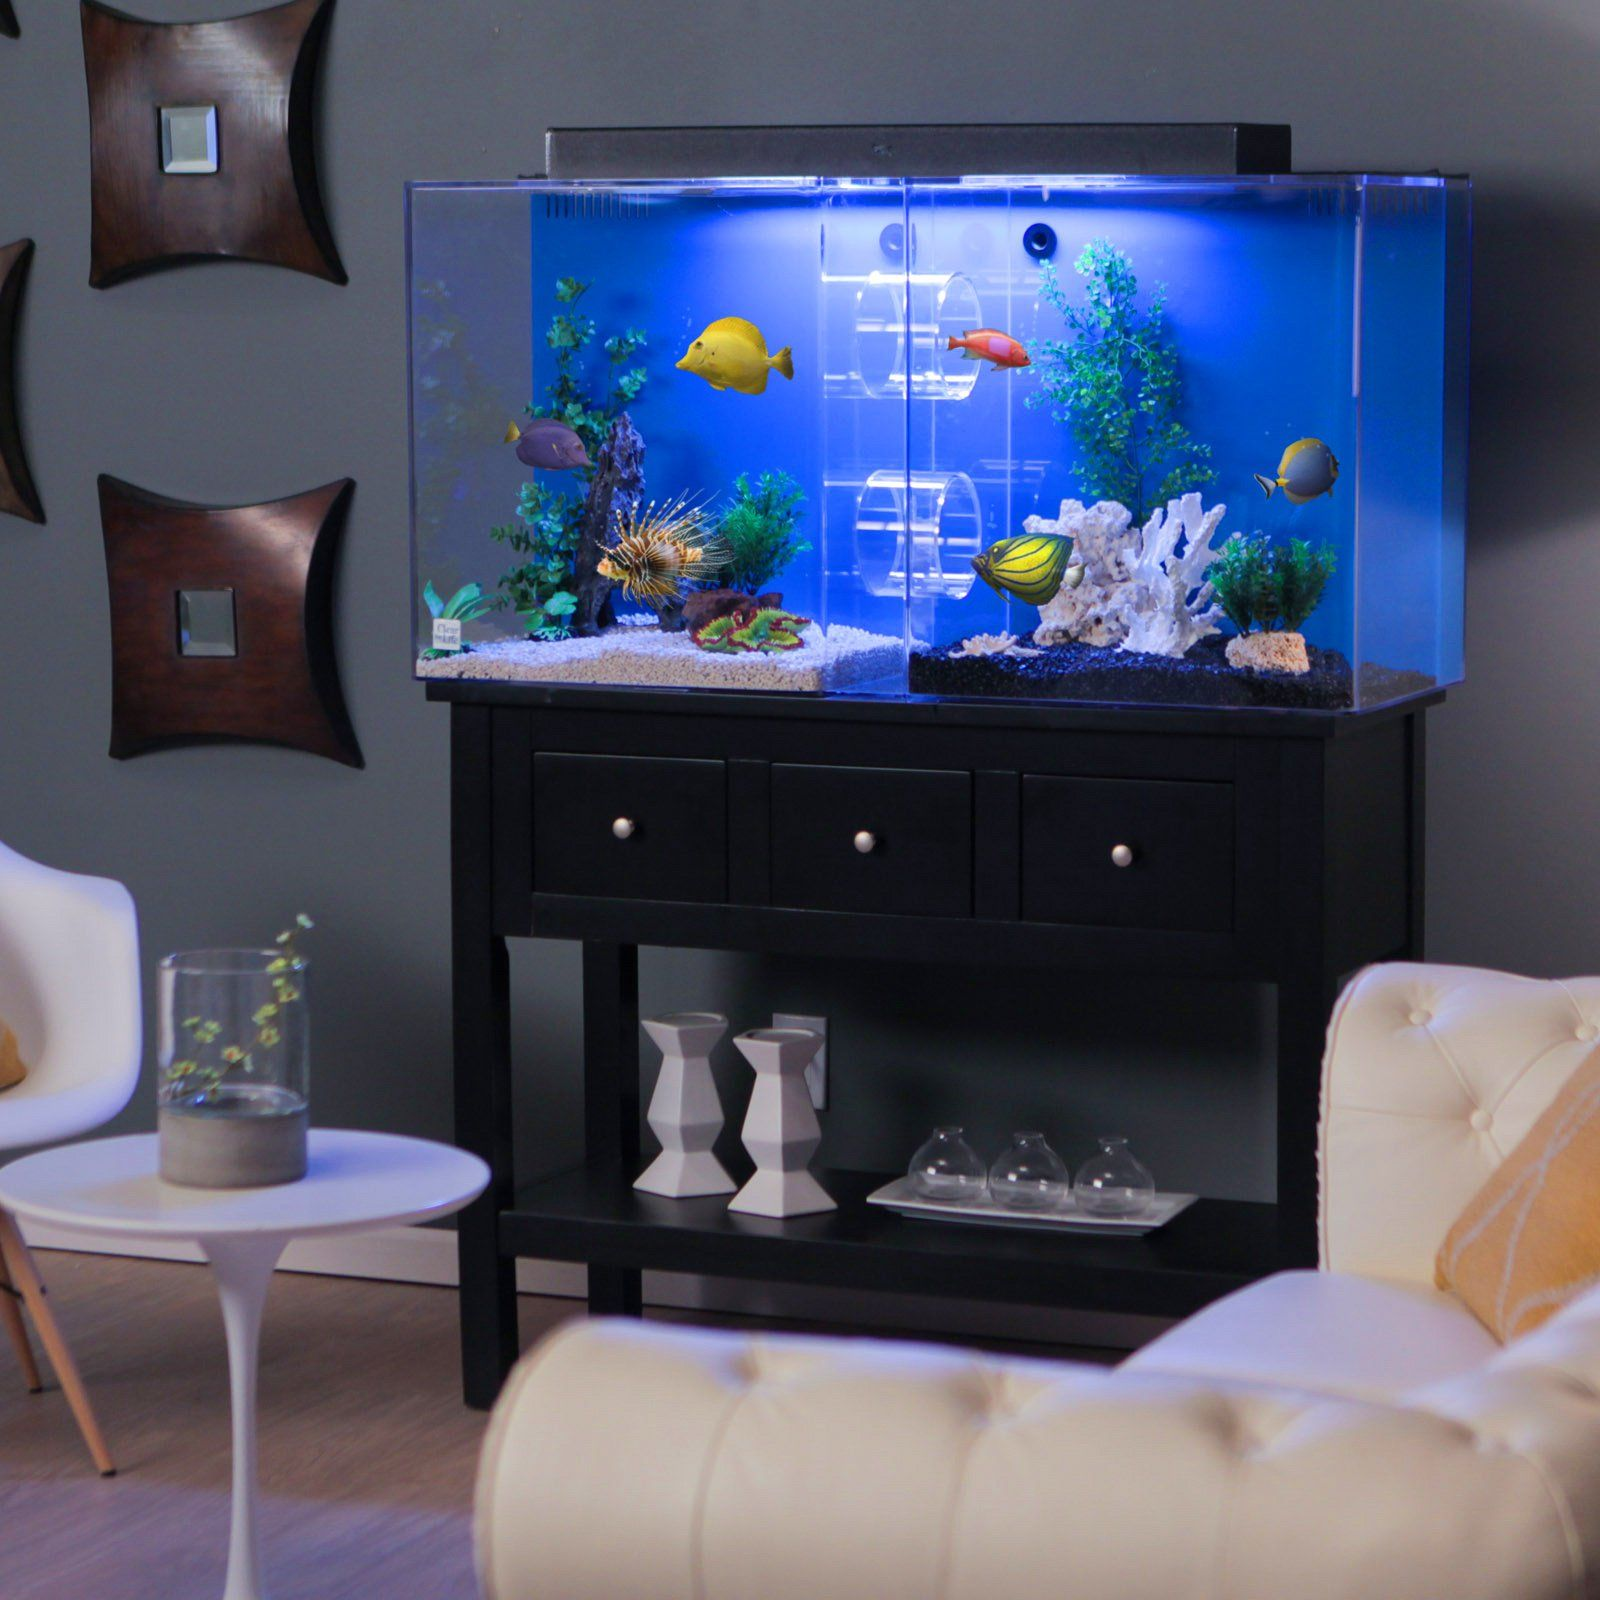 shape u room aquariums seamless stand moon aquarium htm mv view divider light